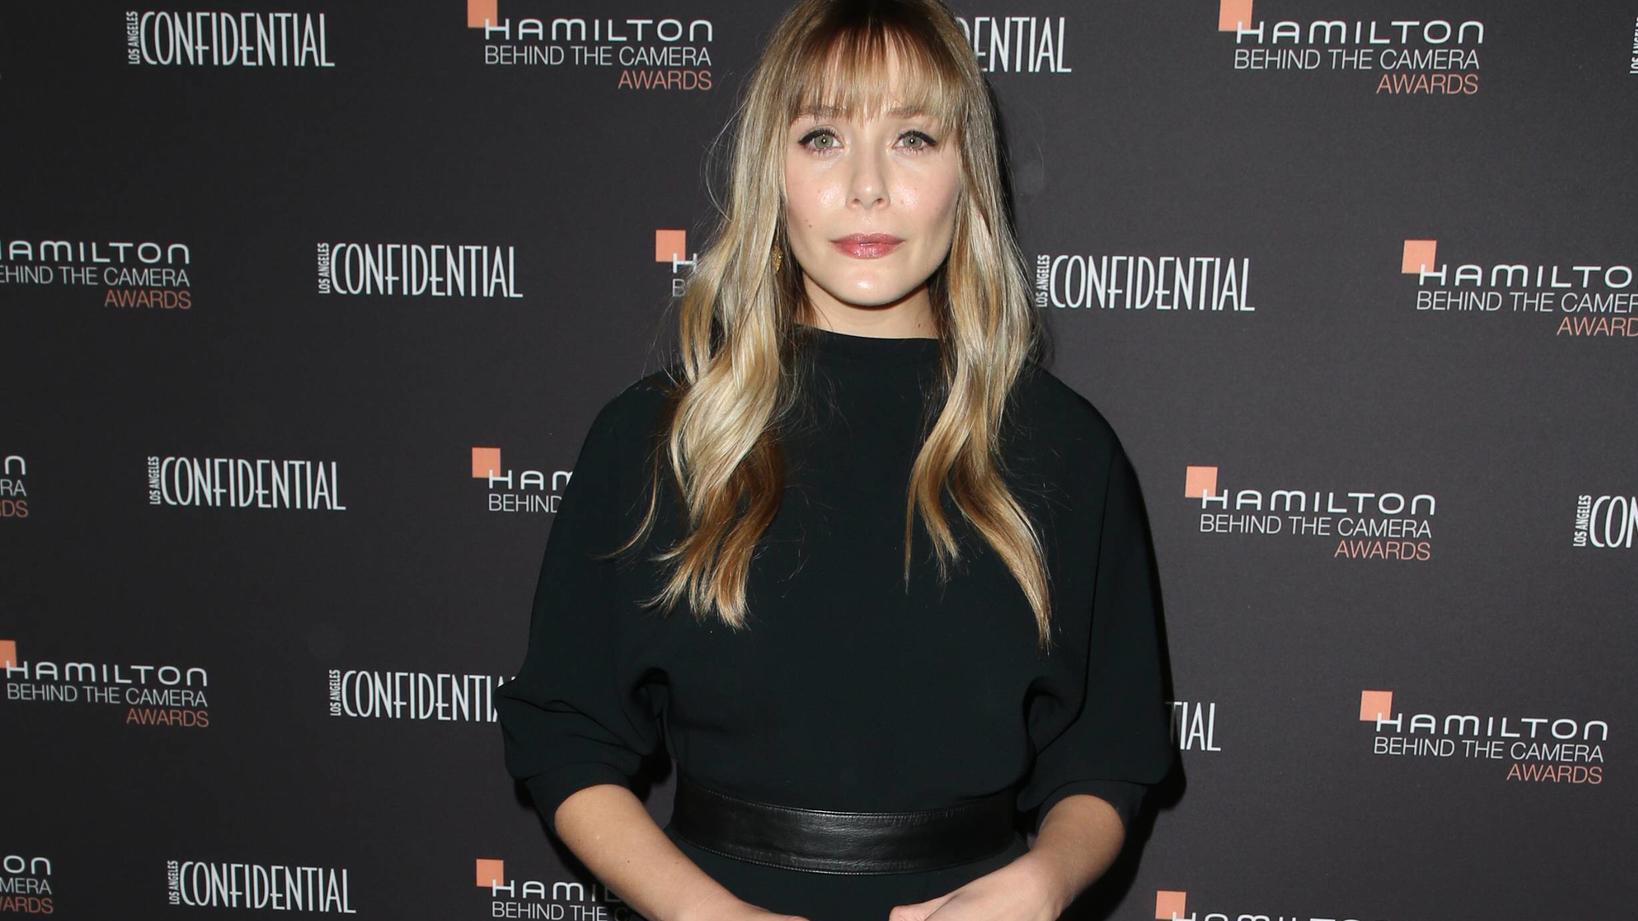 Neuer Haar Style Elizabeth Olsen Trägt Jetzt Pony